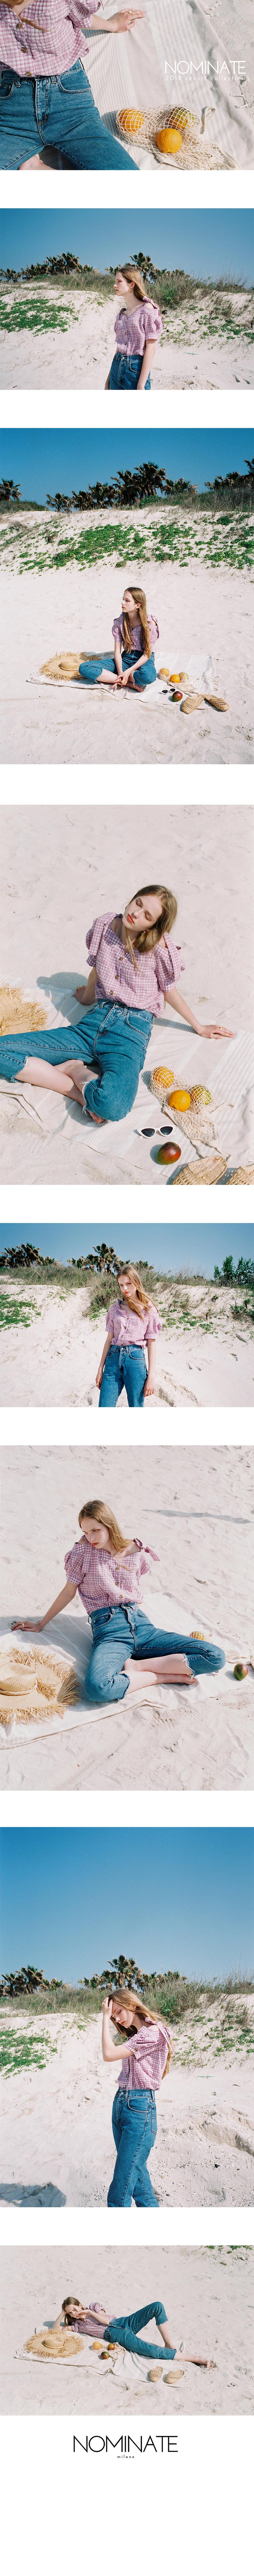 NOMINATE - Korean Fashion - #Kfashion - Off-Shoulder Puff Blouse Purple Check